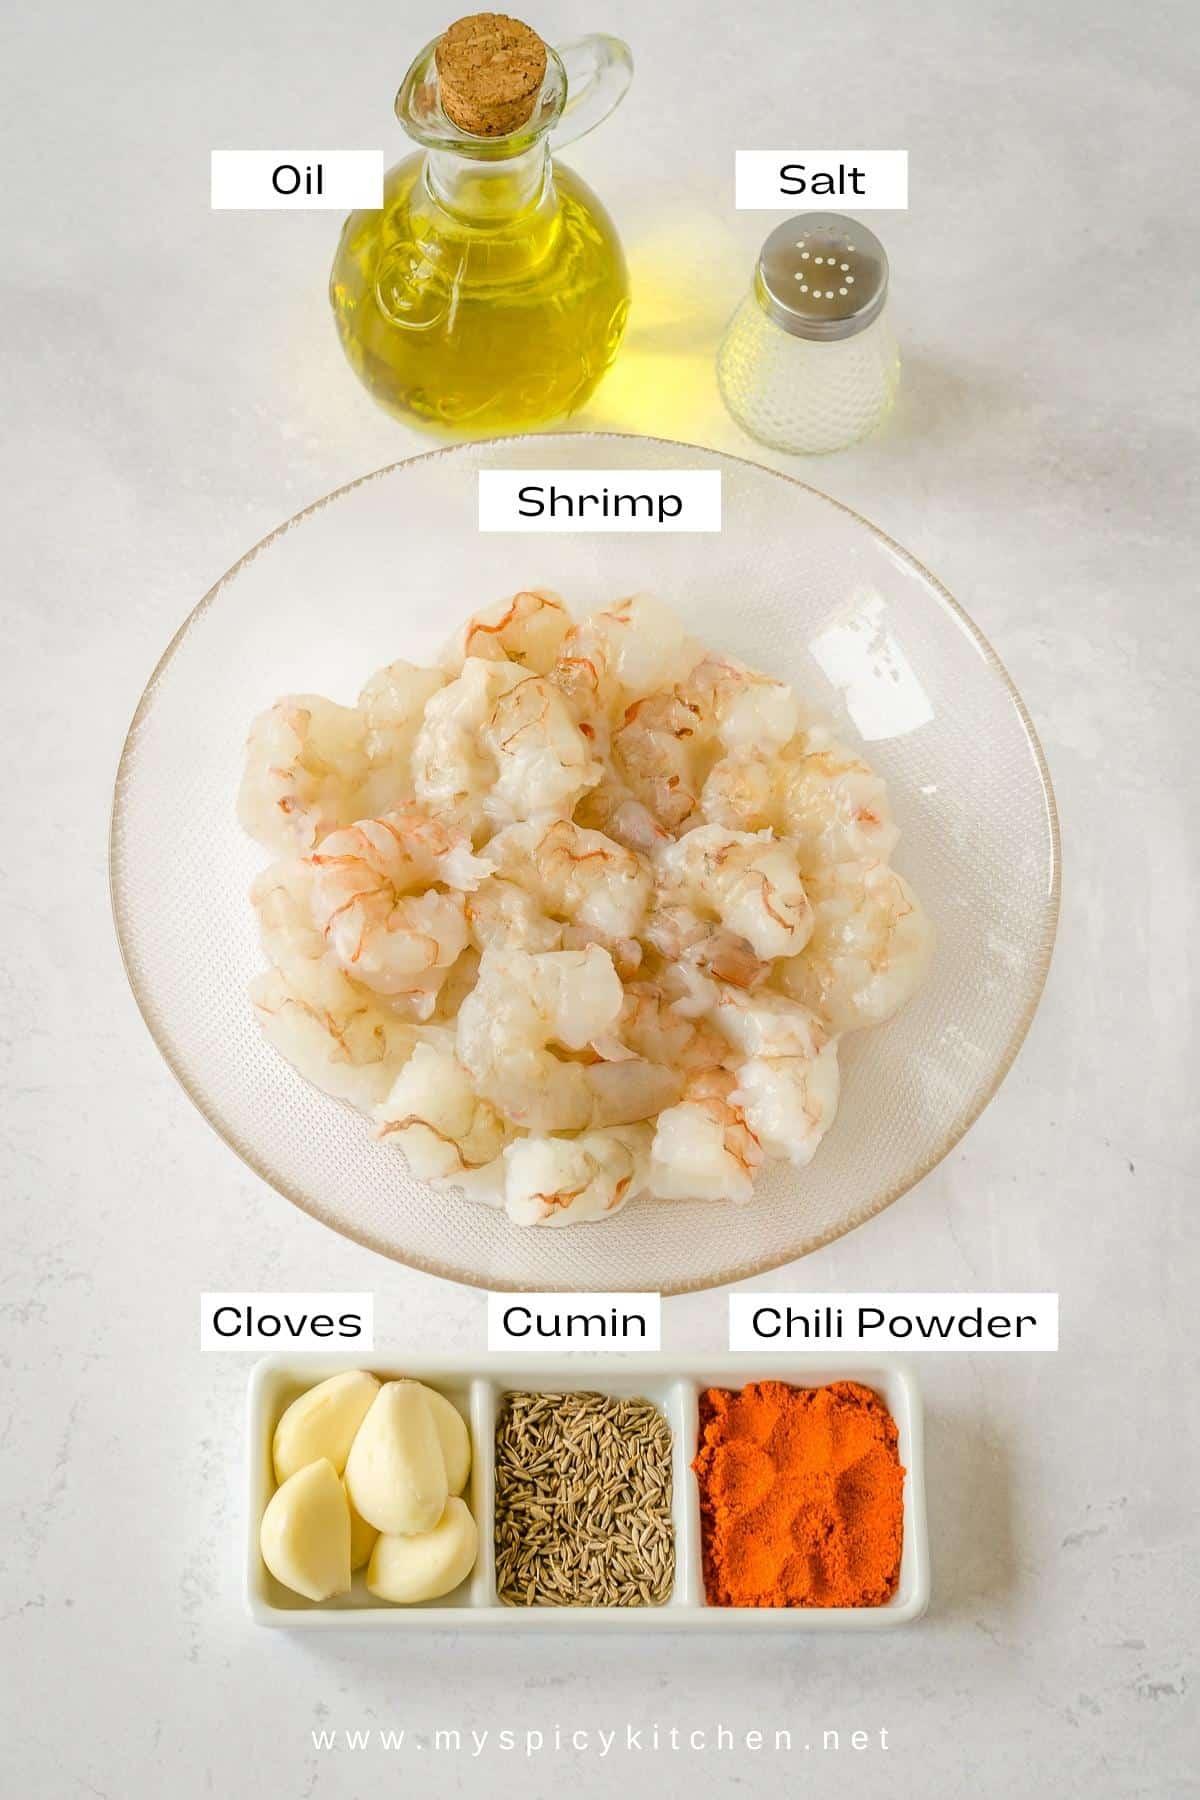 Ingredients for shrimp chili garlic stir fry.